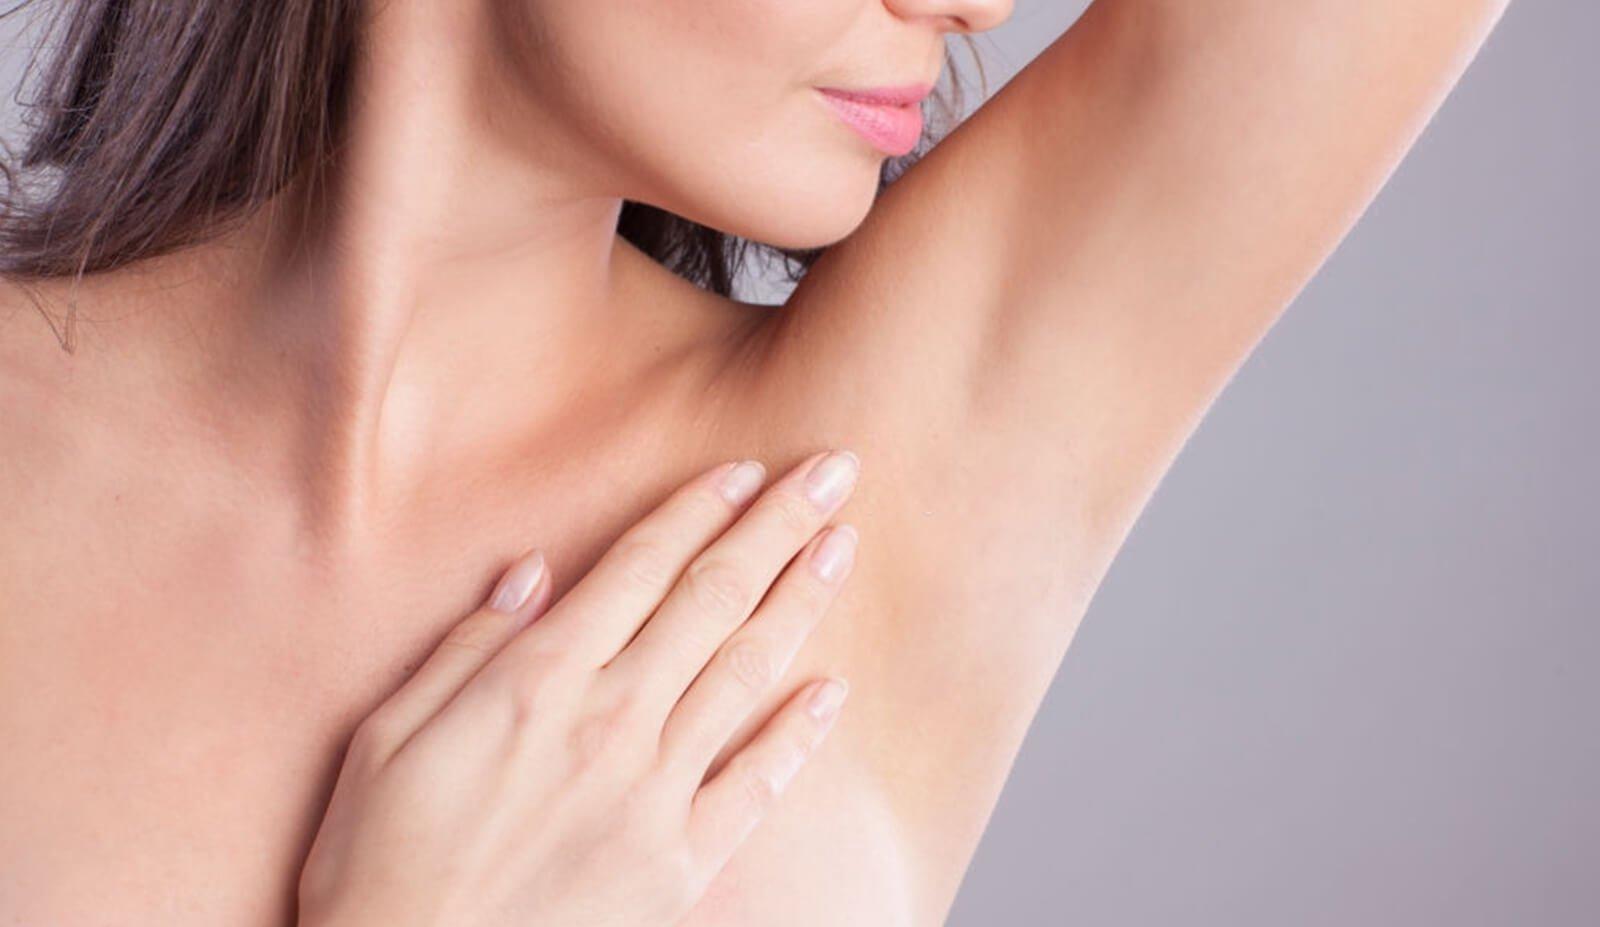 Underarm hair removal